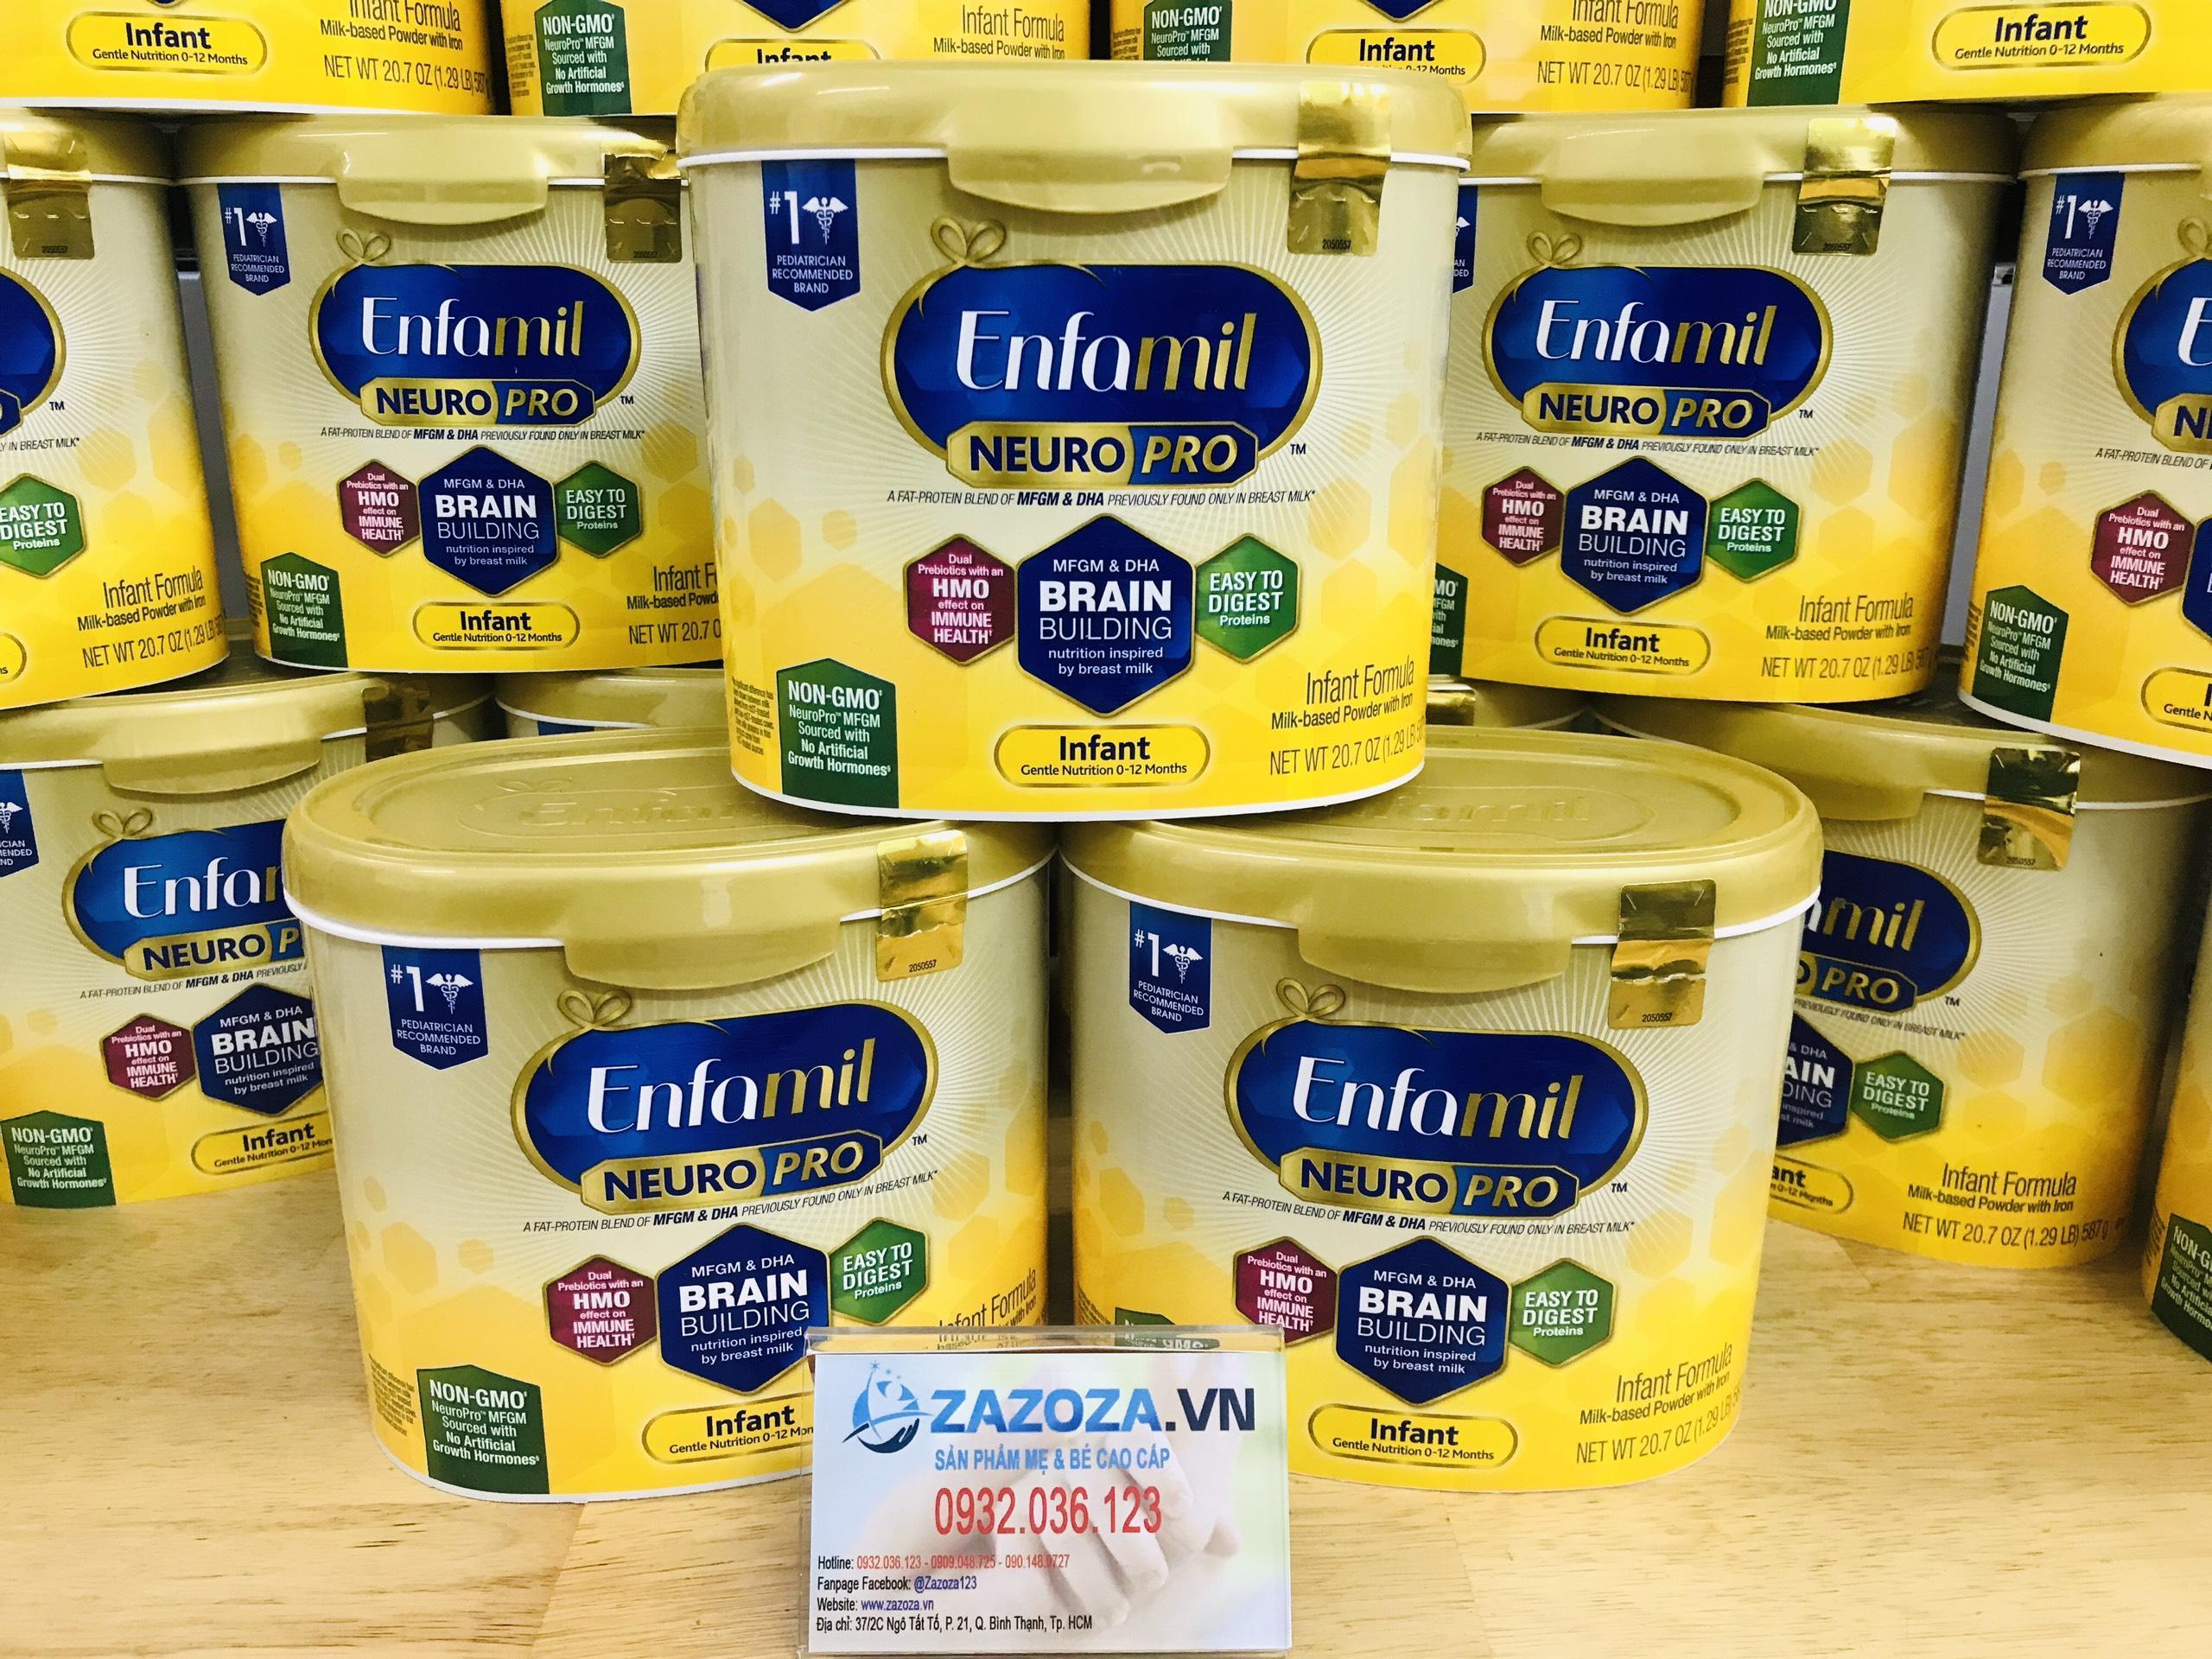 Sữa bột Enfamil Neuro Pro NON-GMO Infant Formula 587g nhập...